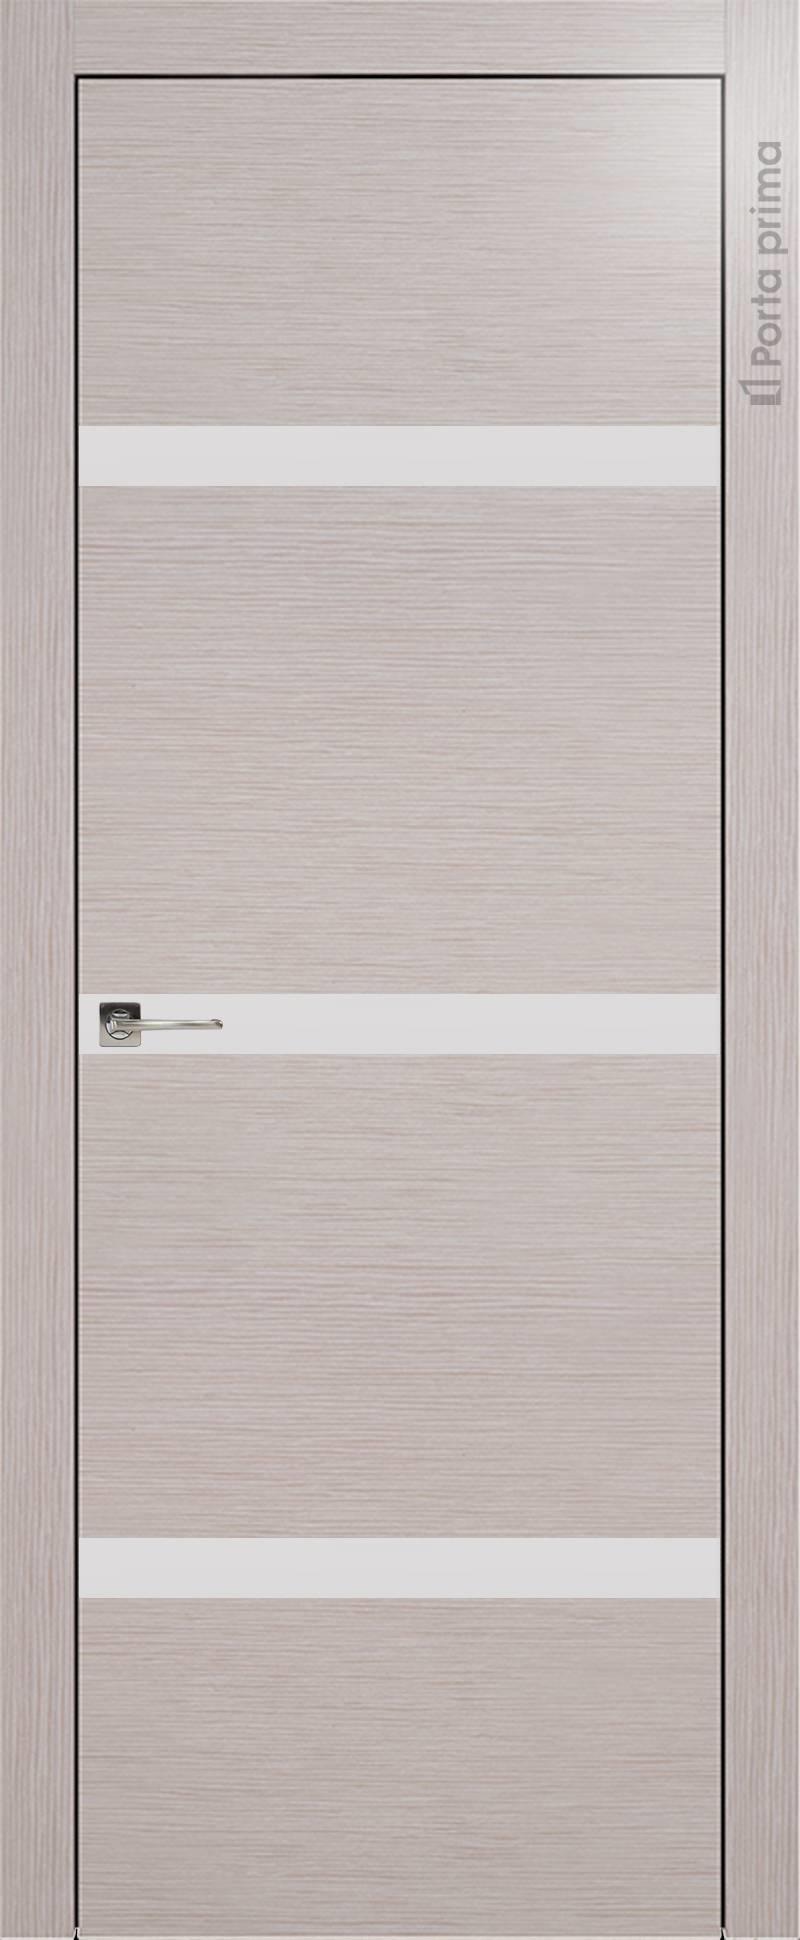 Tivoli Г-4 цвет - Дымчатый дуб Без стекла (ДГ)